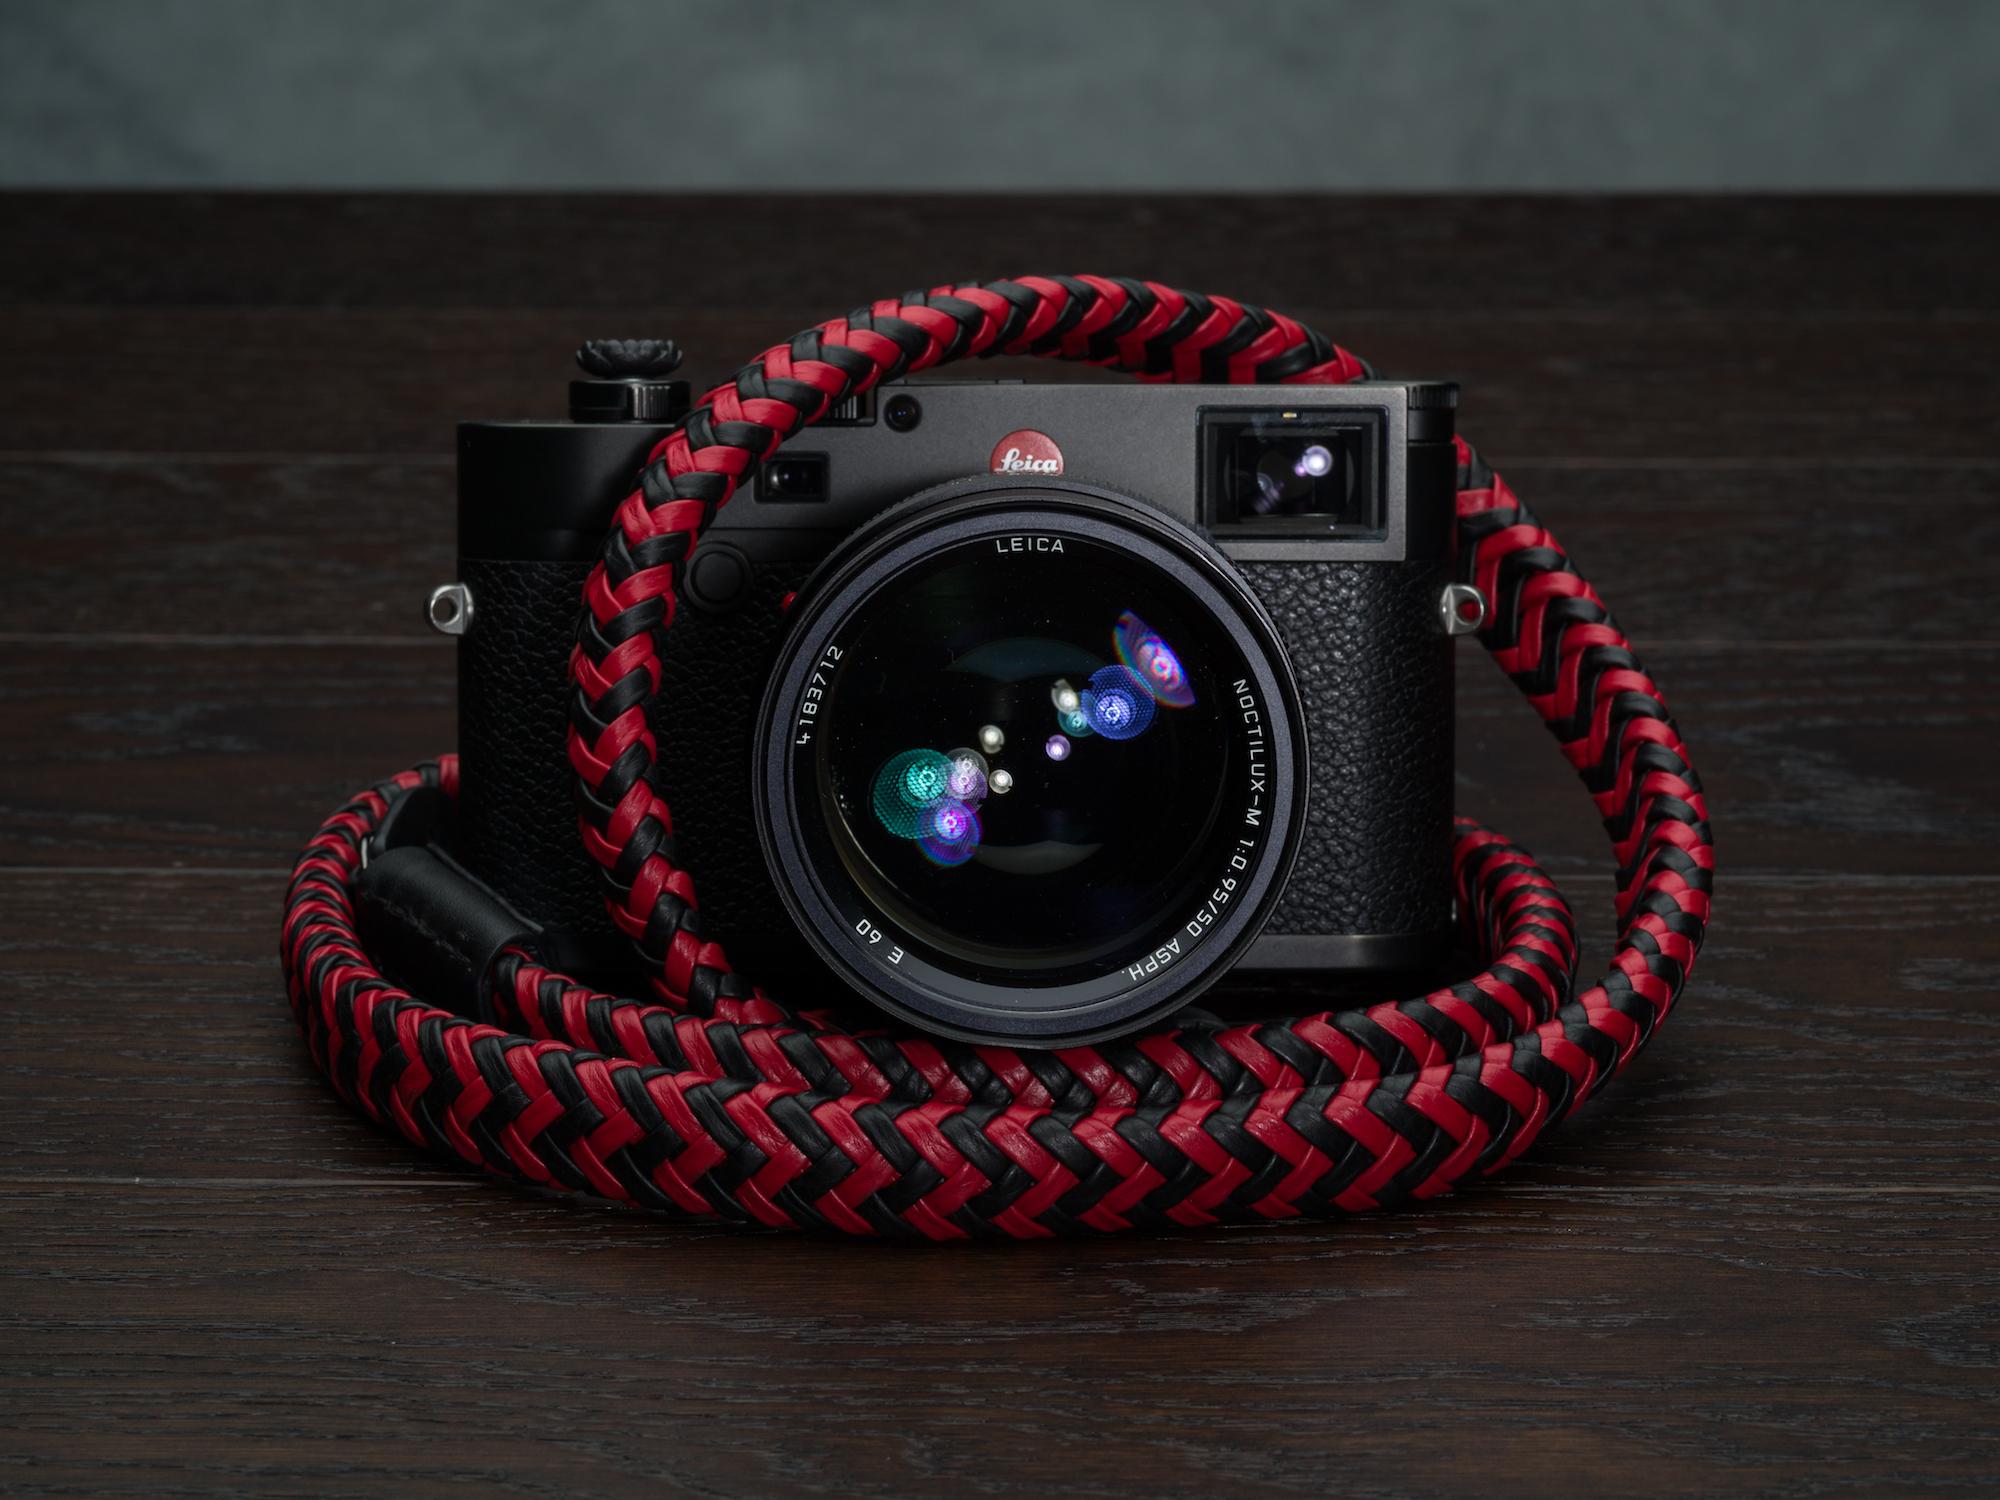 Vi Vante Matador Phoenix Braided Luxury Leather Camera Strap Leica M10 Noctilux 3.jpg